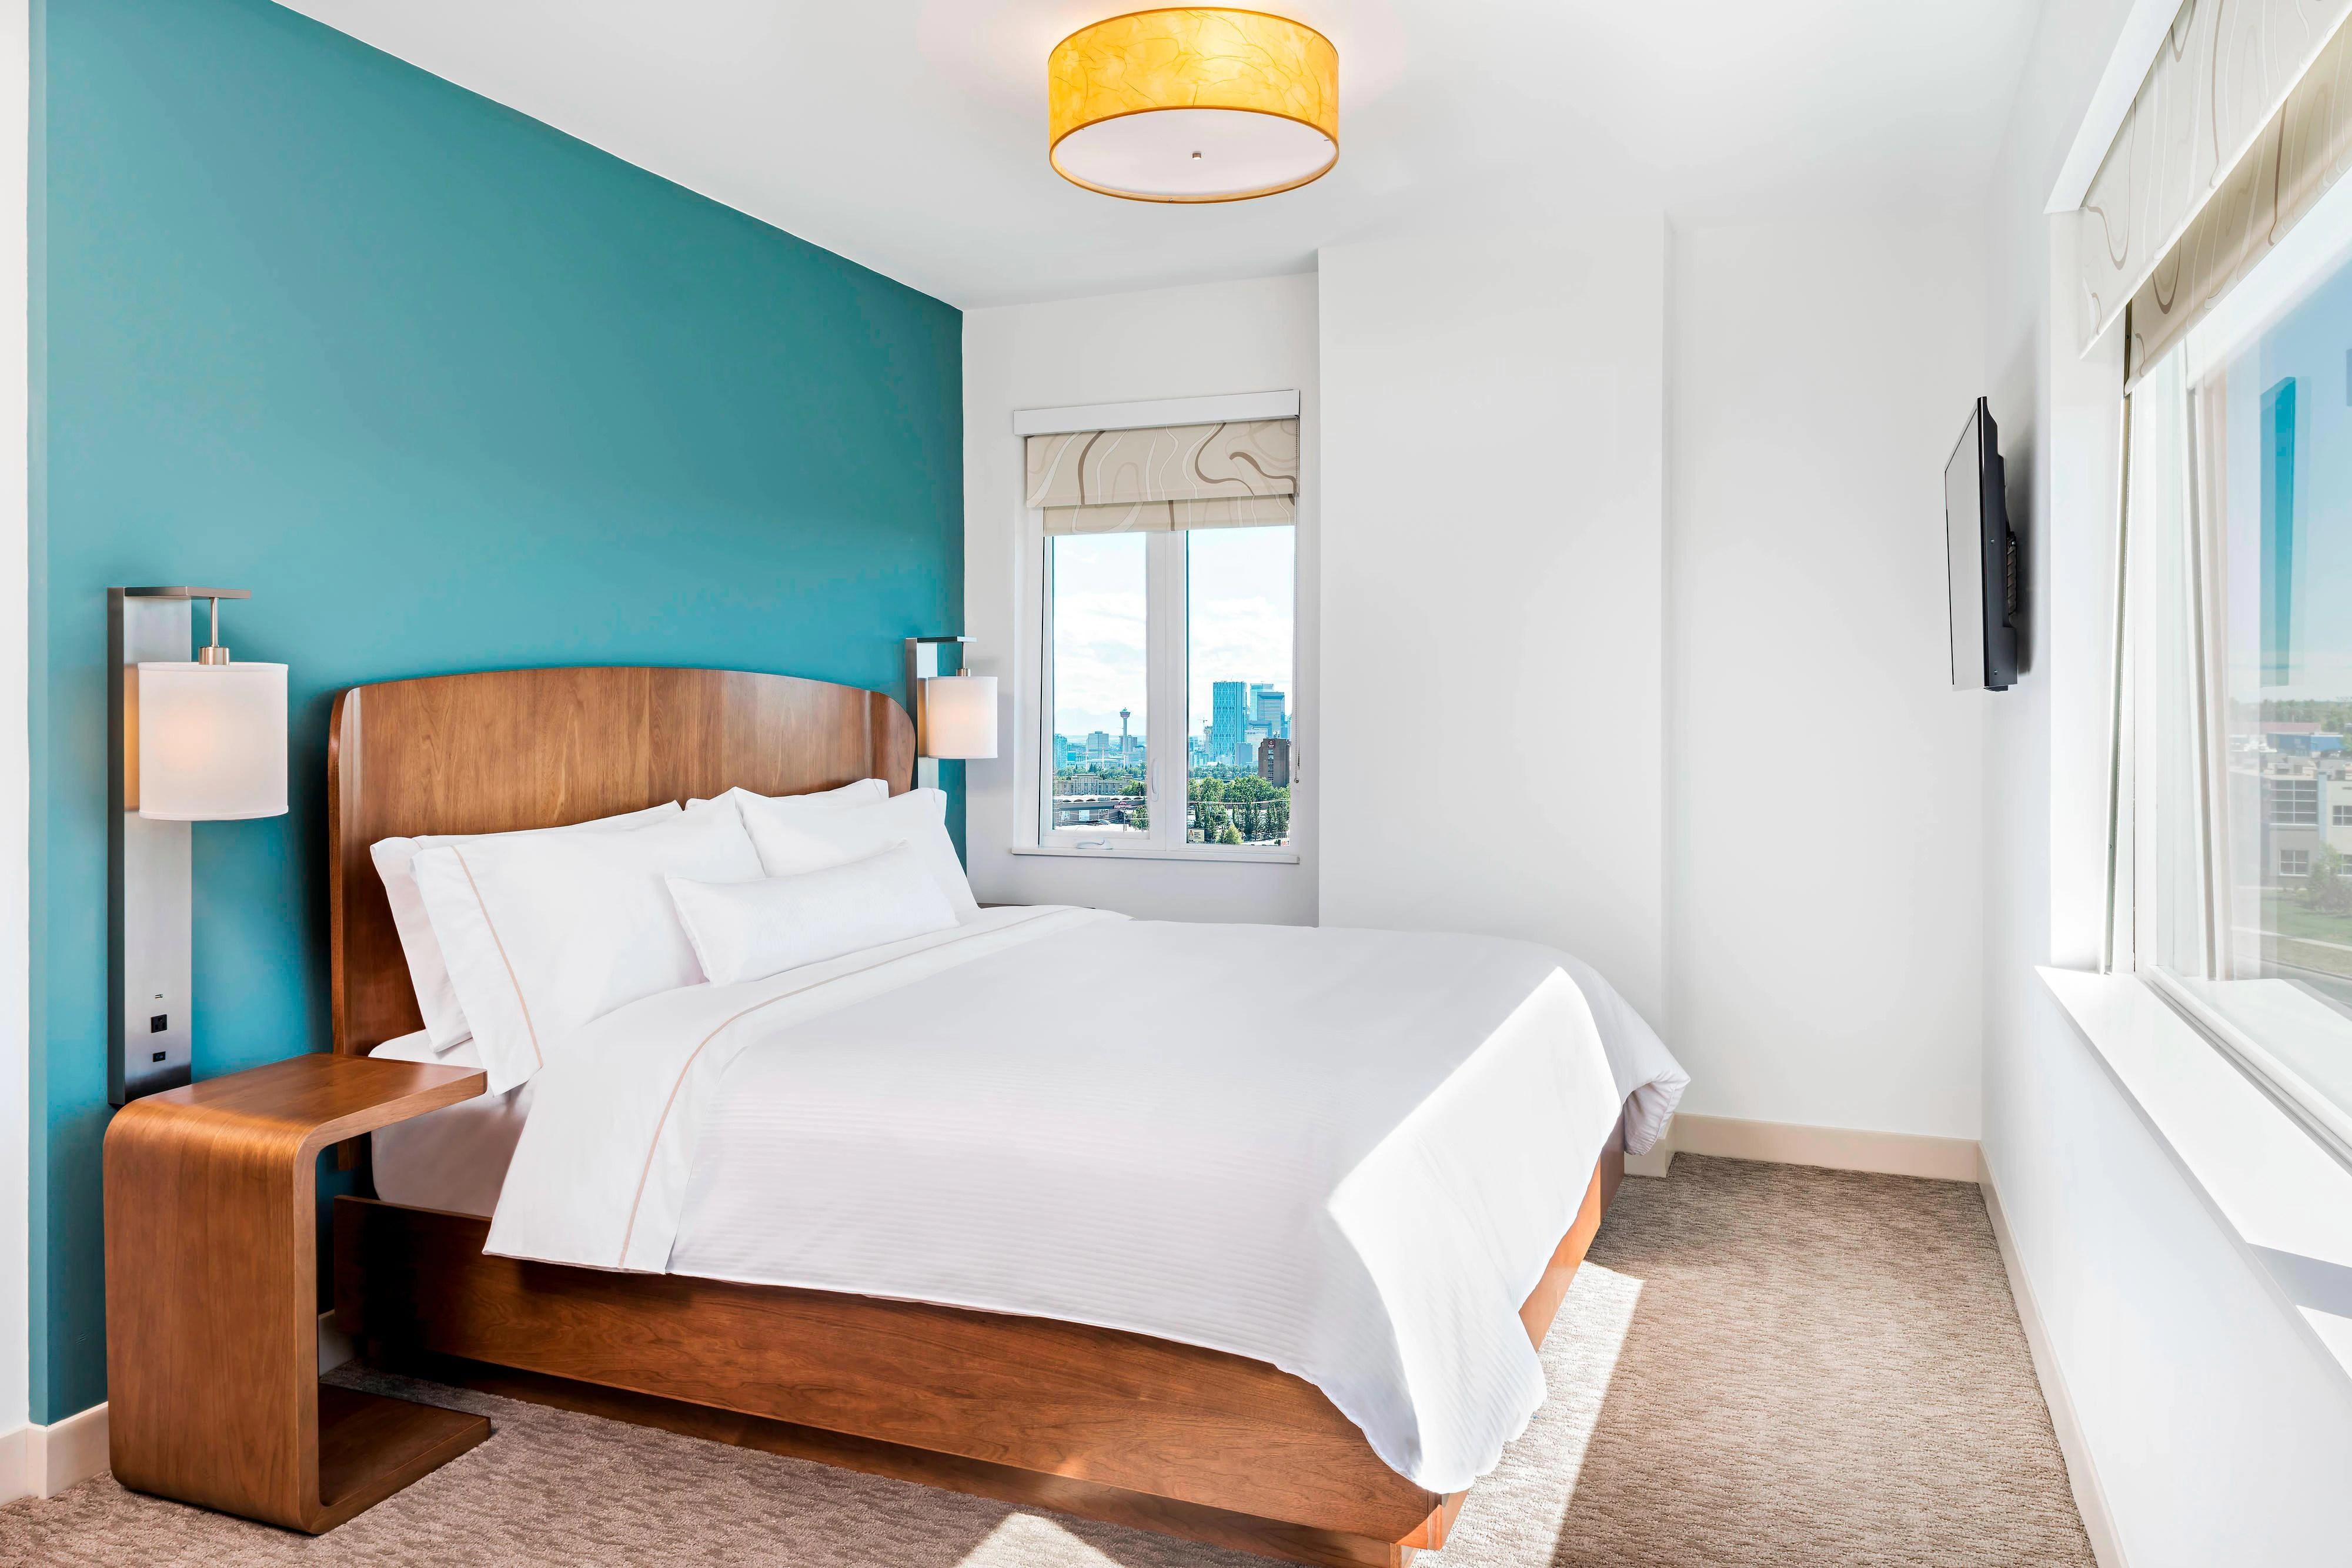 Element Calgary Airport Hotel Amenities Room